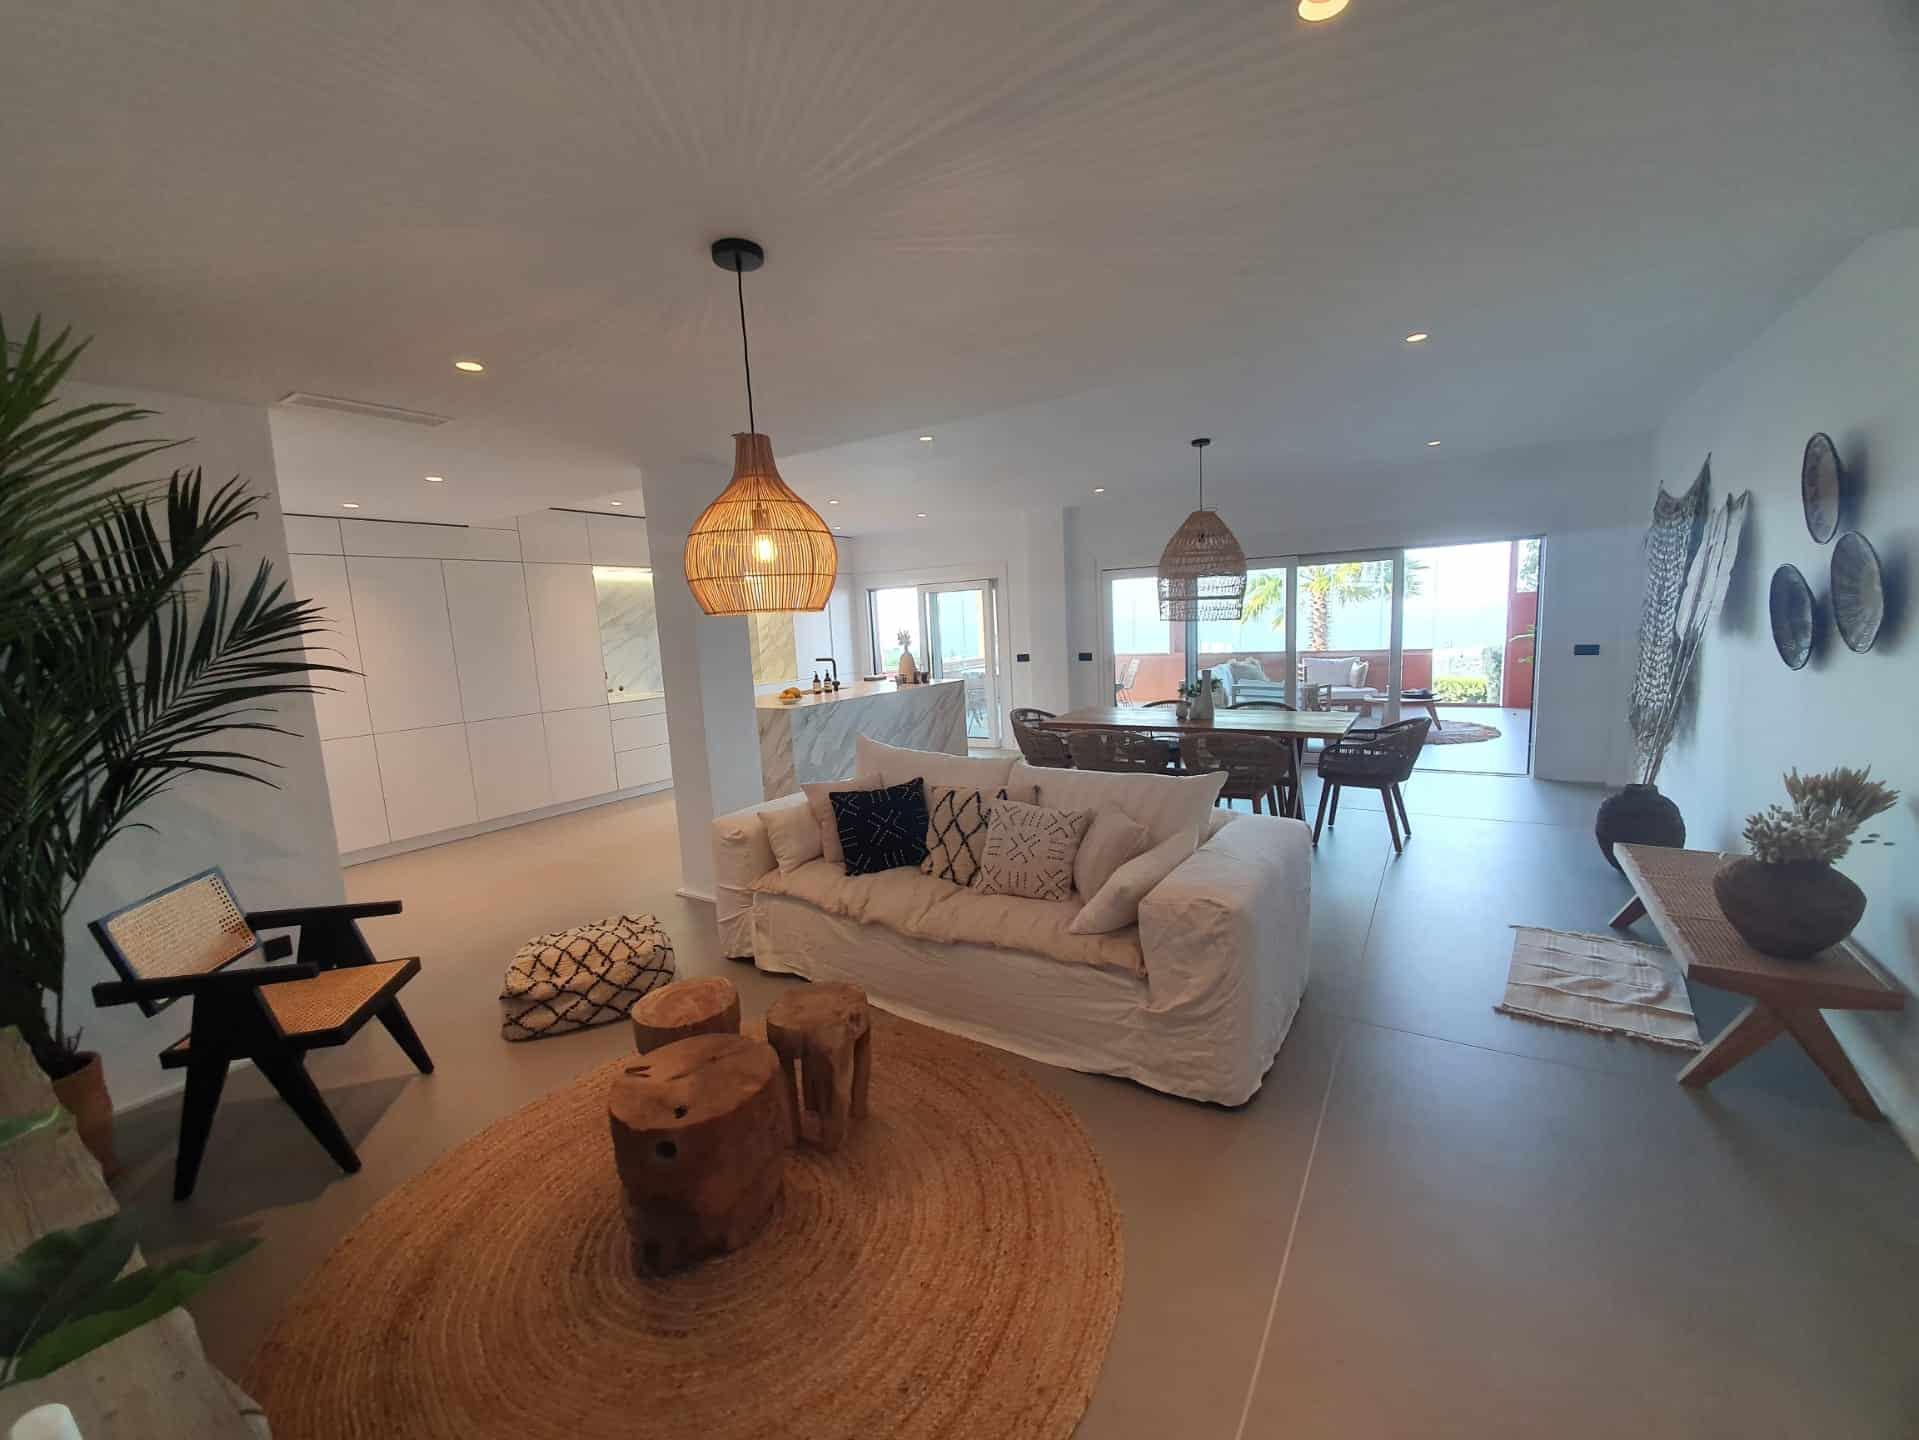 salón-comedor-cocina reforma piso Marbella, decoración ibizenca